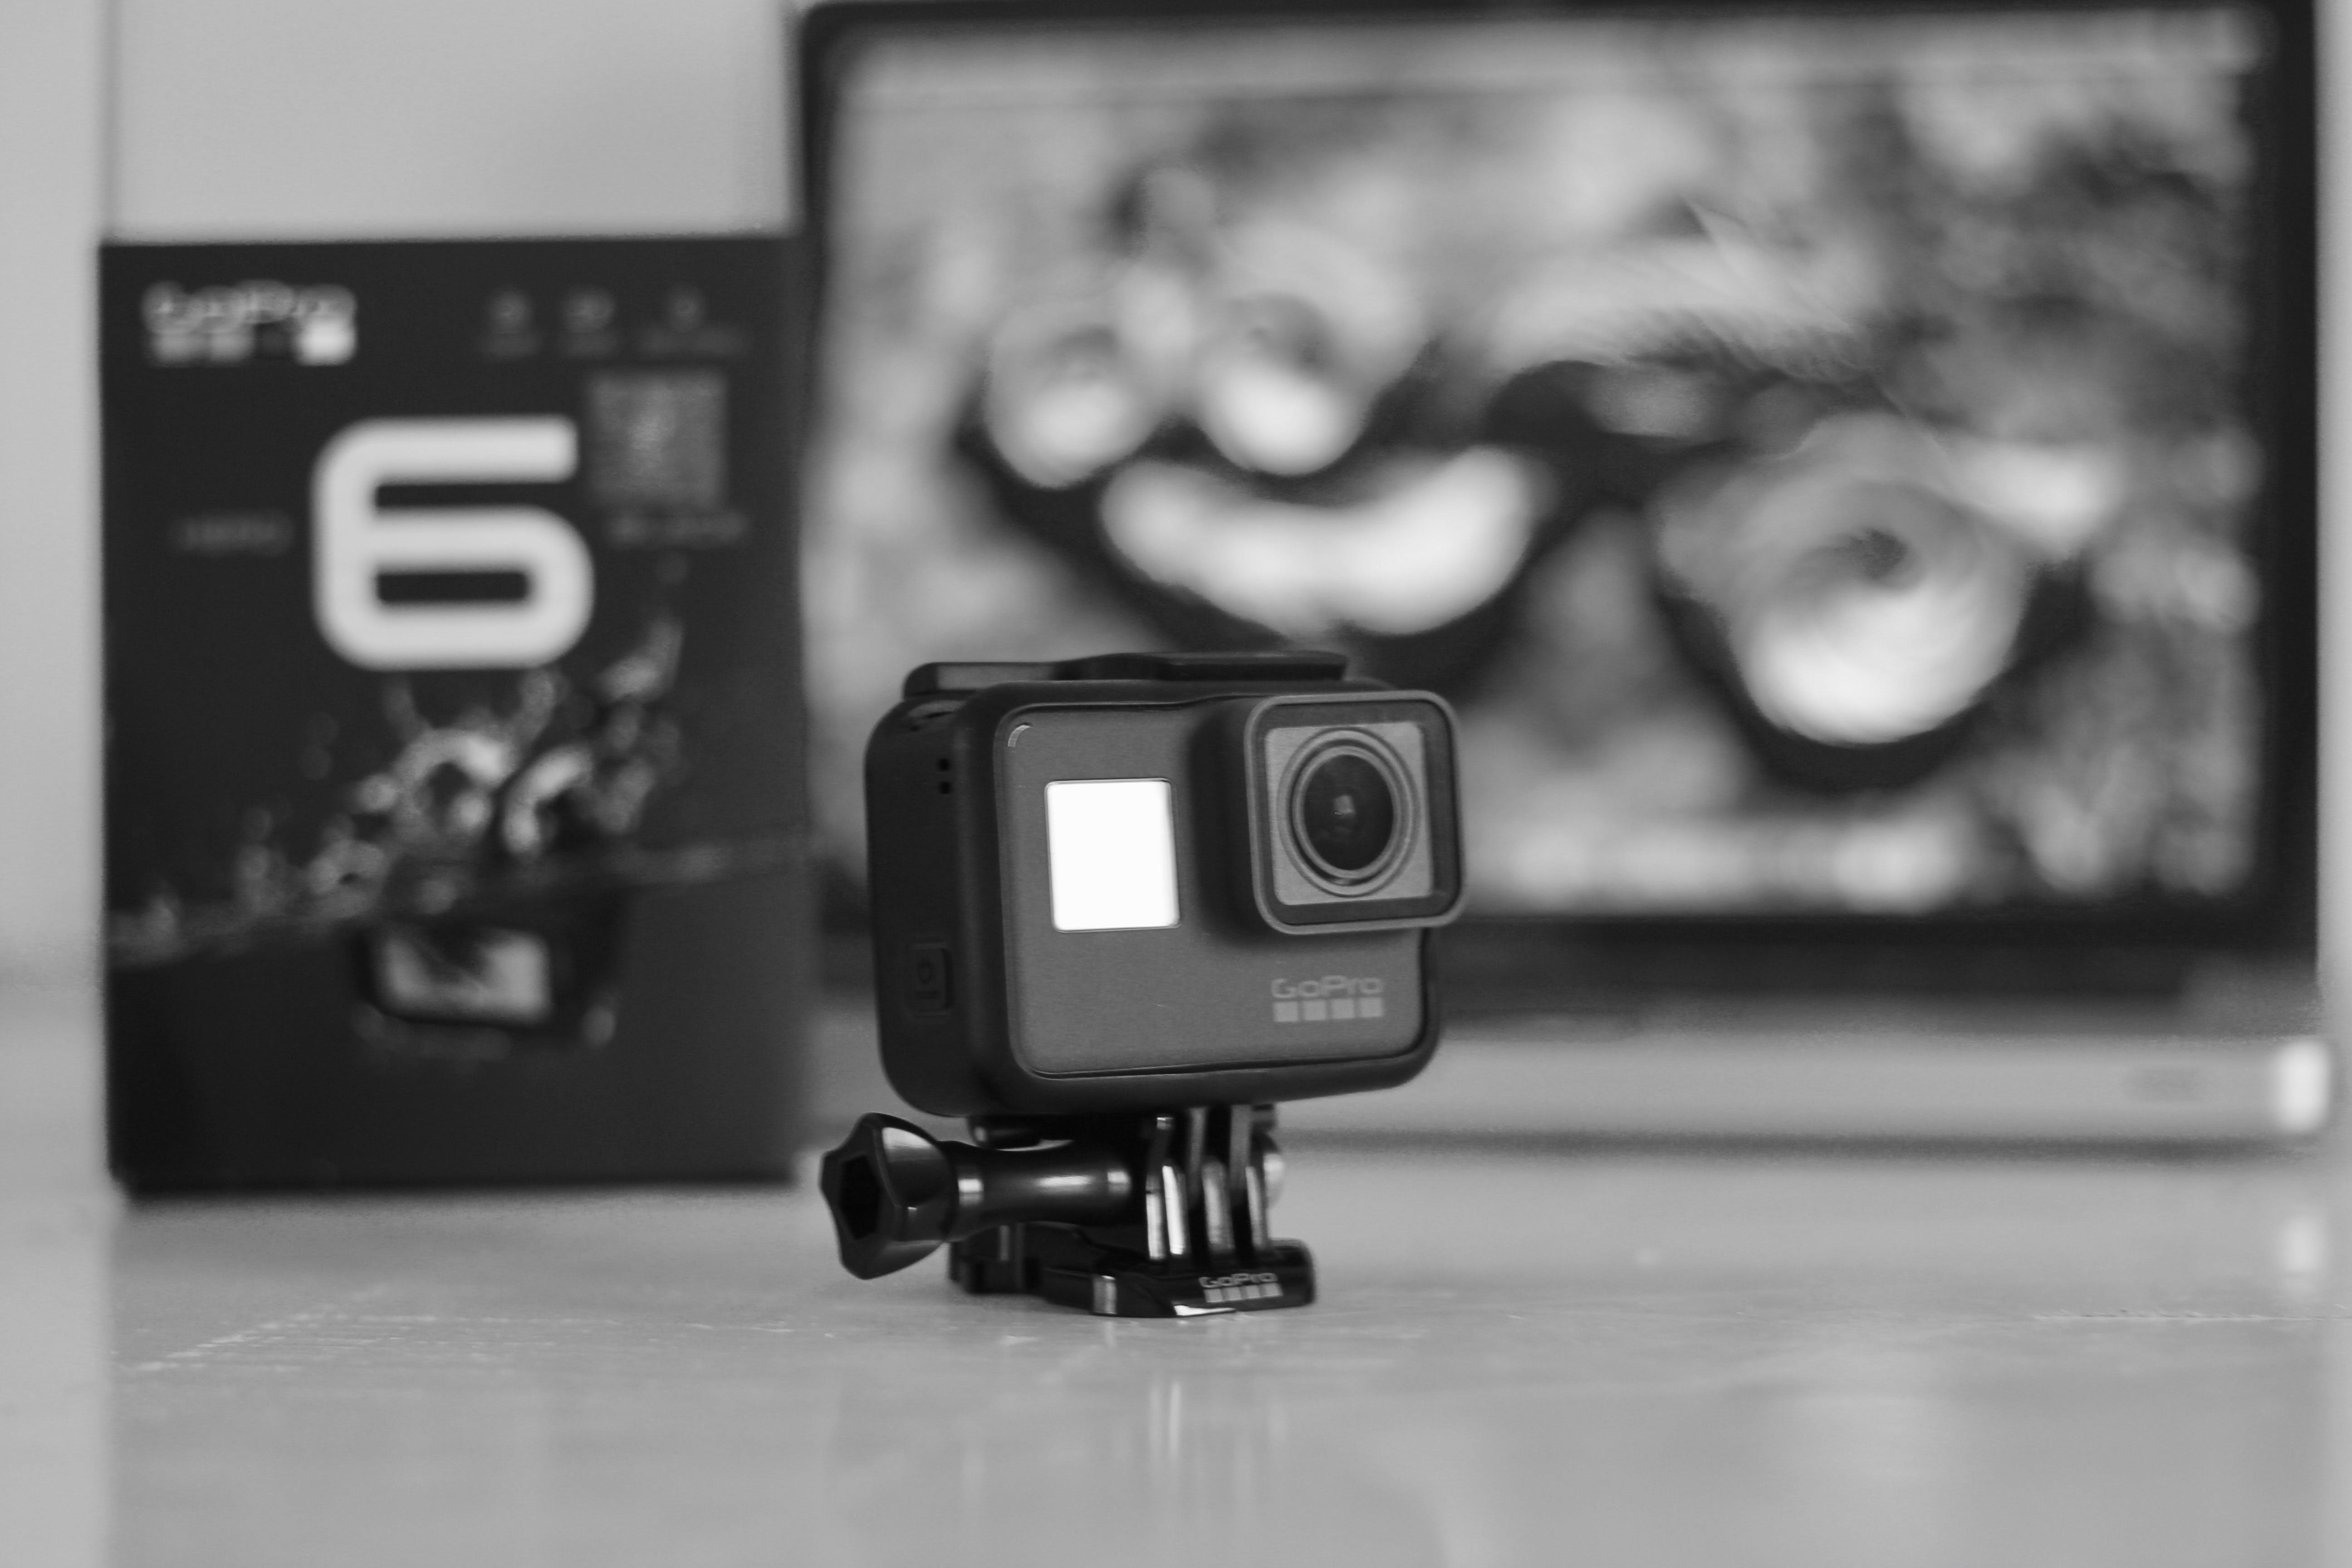 Free stock photo of action camera, black and white, black background, camera